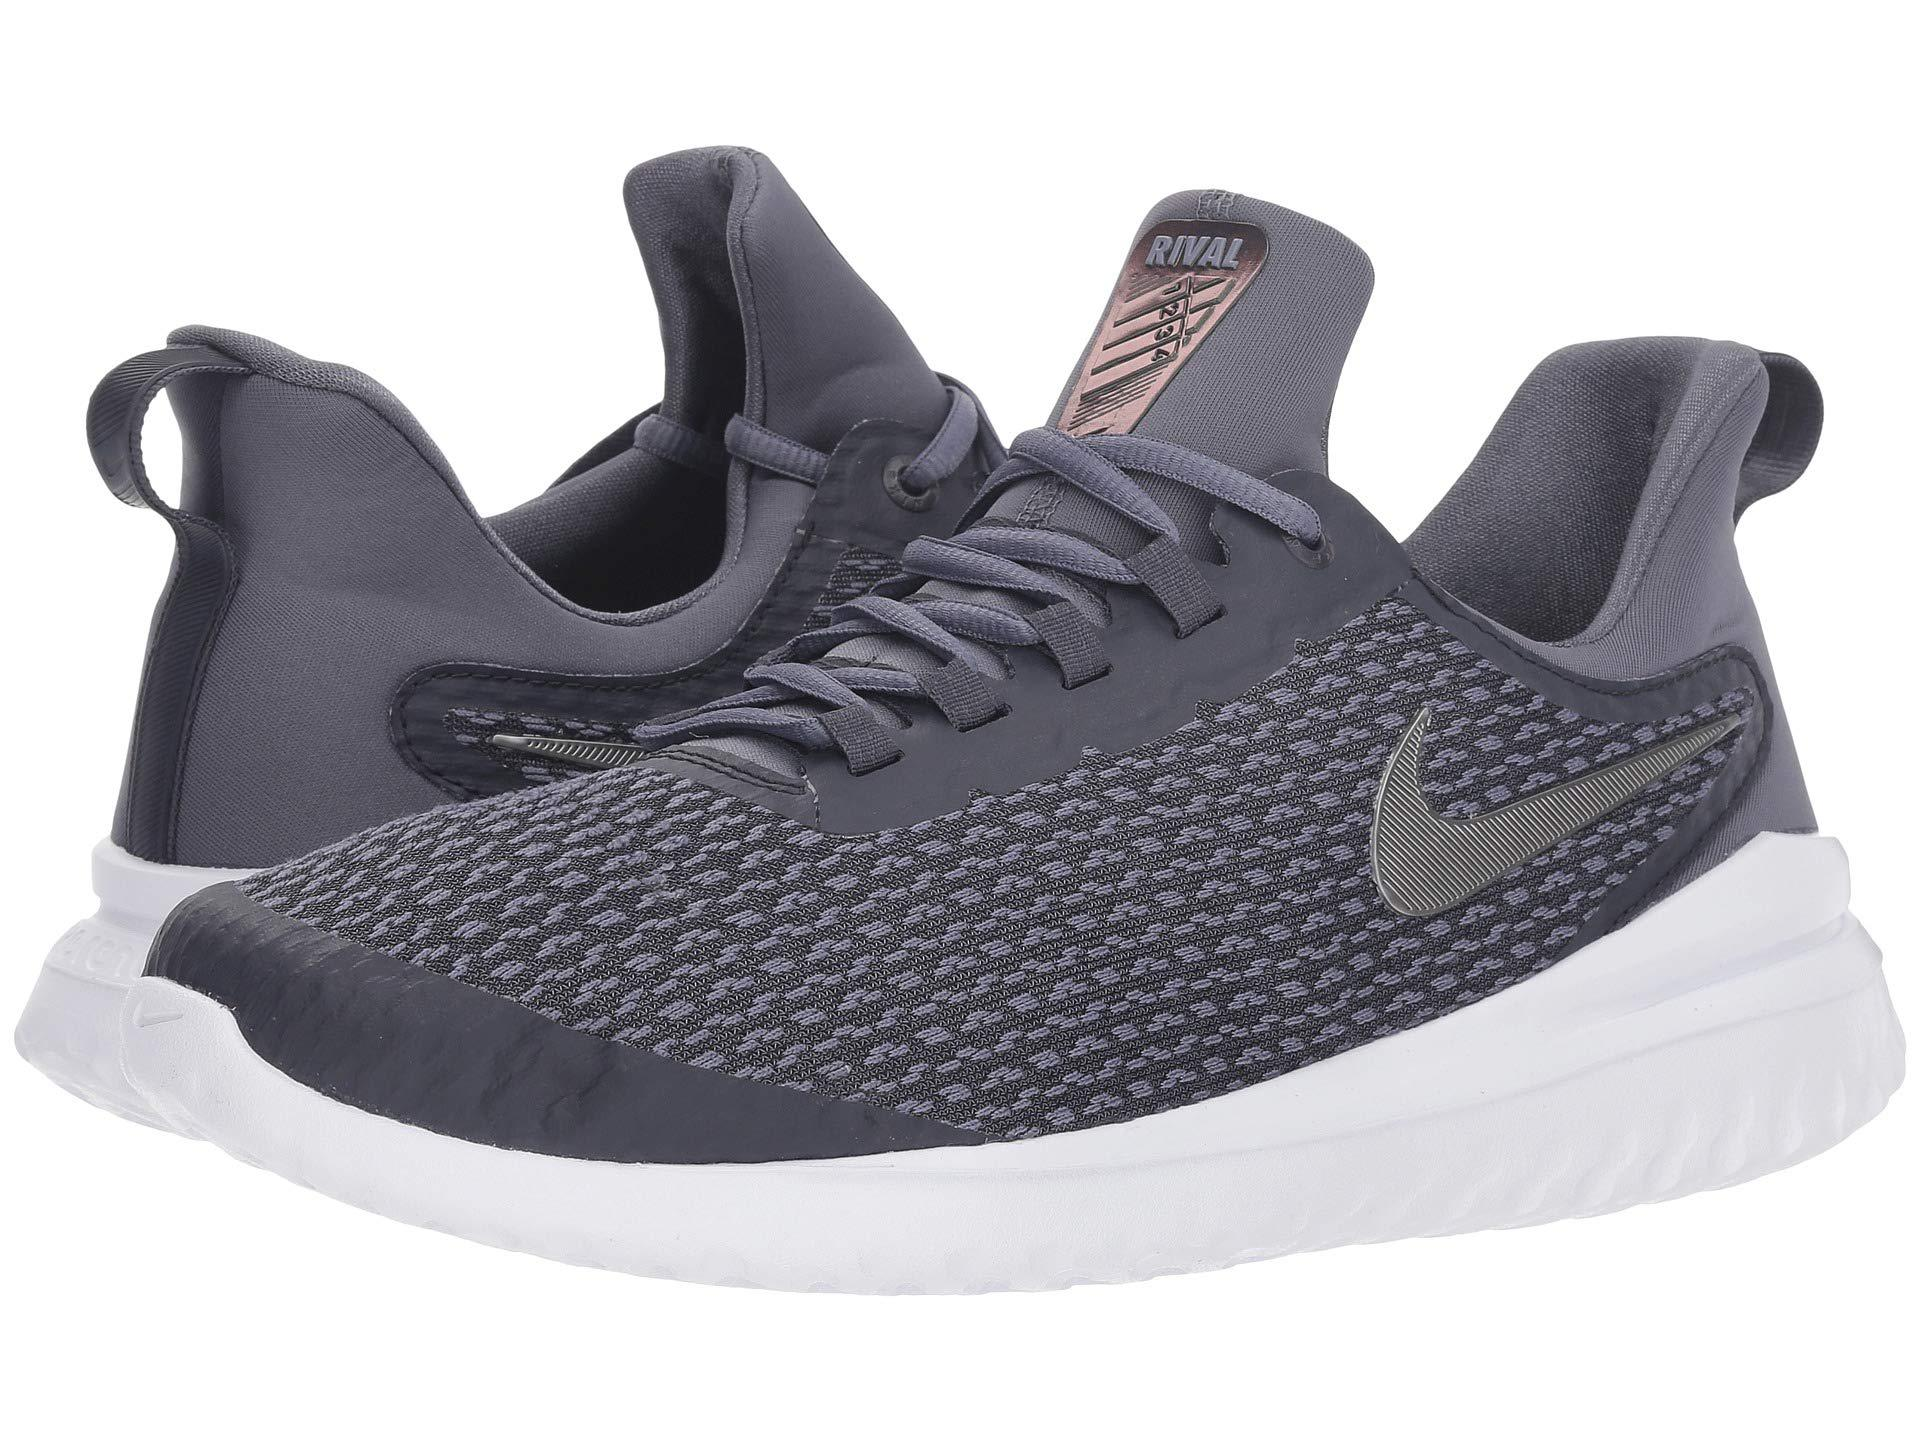 9af881842bb Lyst - Nike Renew Rival for Men